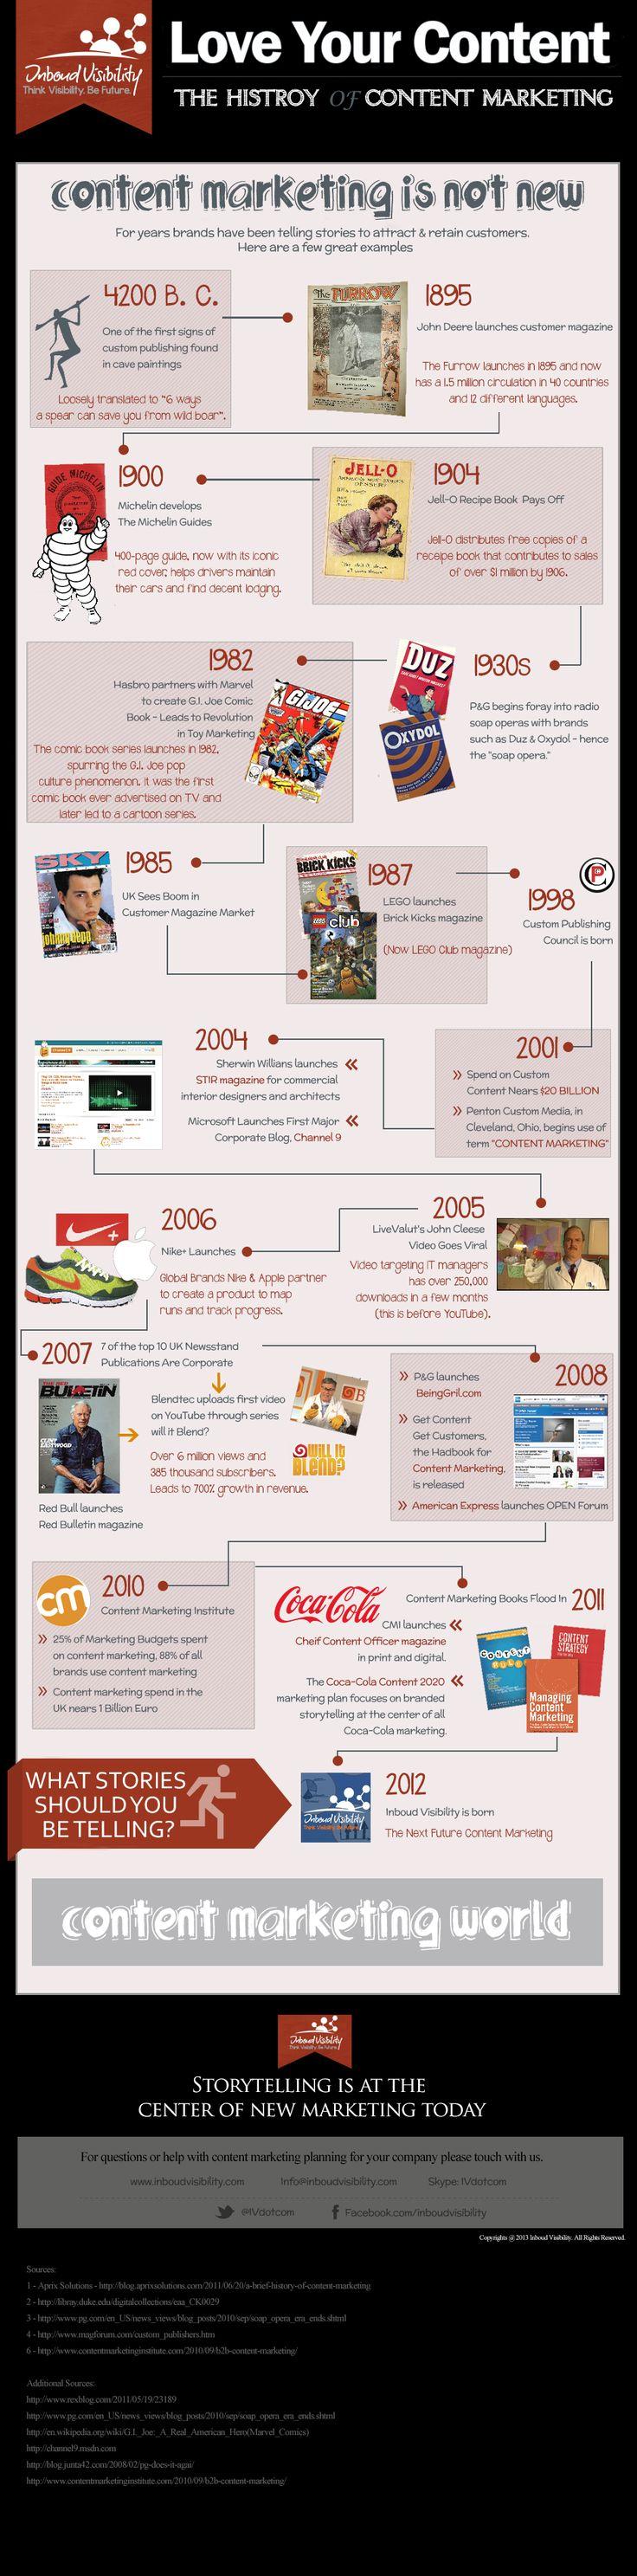 413 best Online Marketing images on Pinterest | Content marketing ...